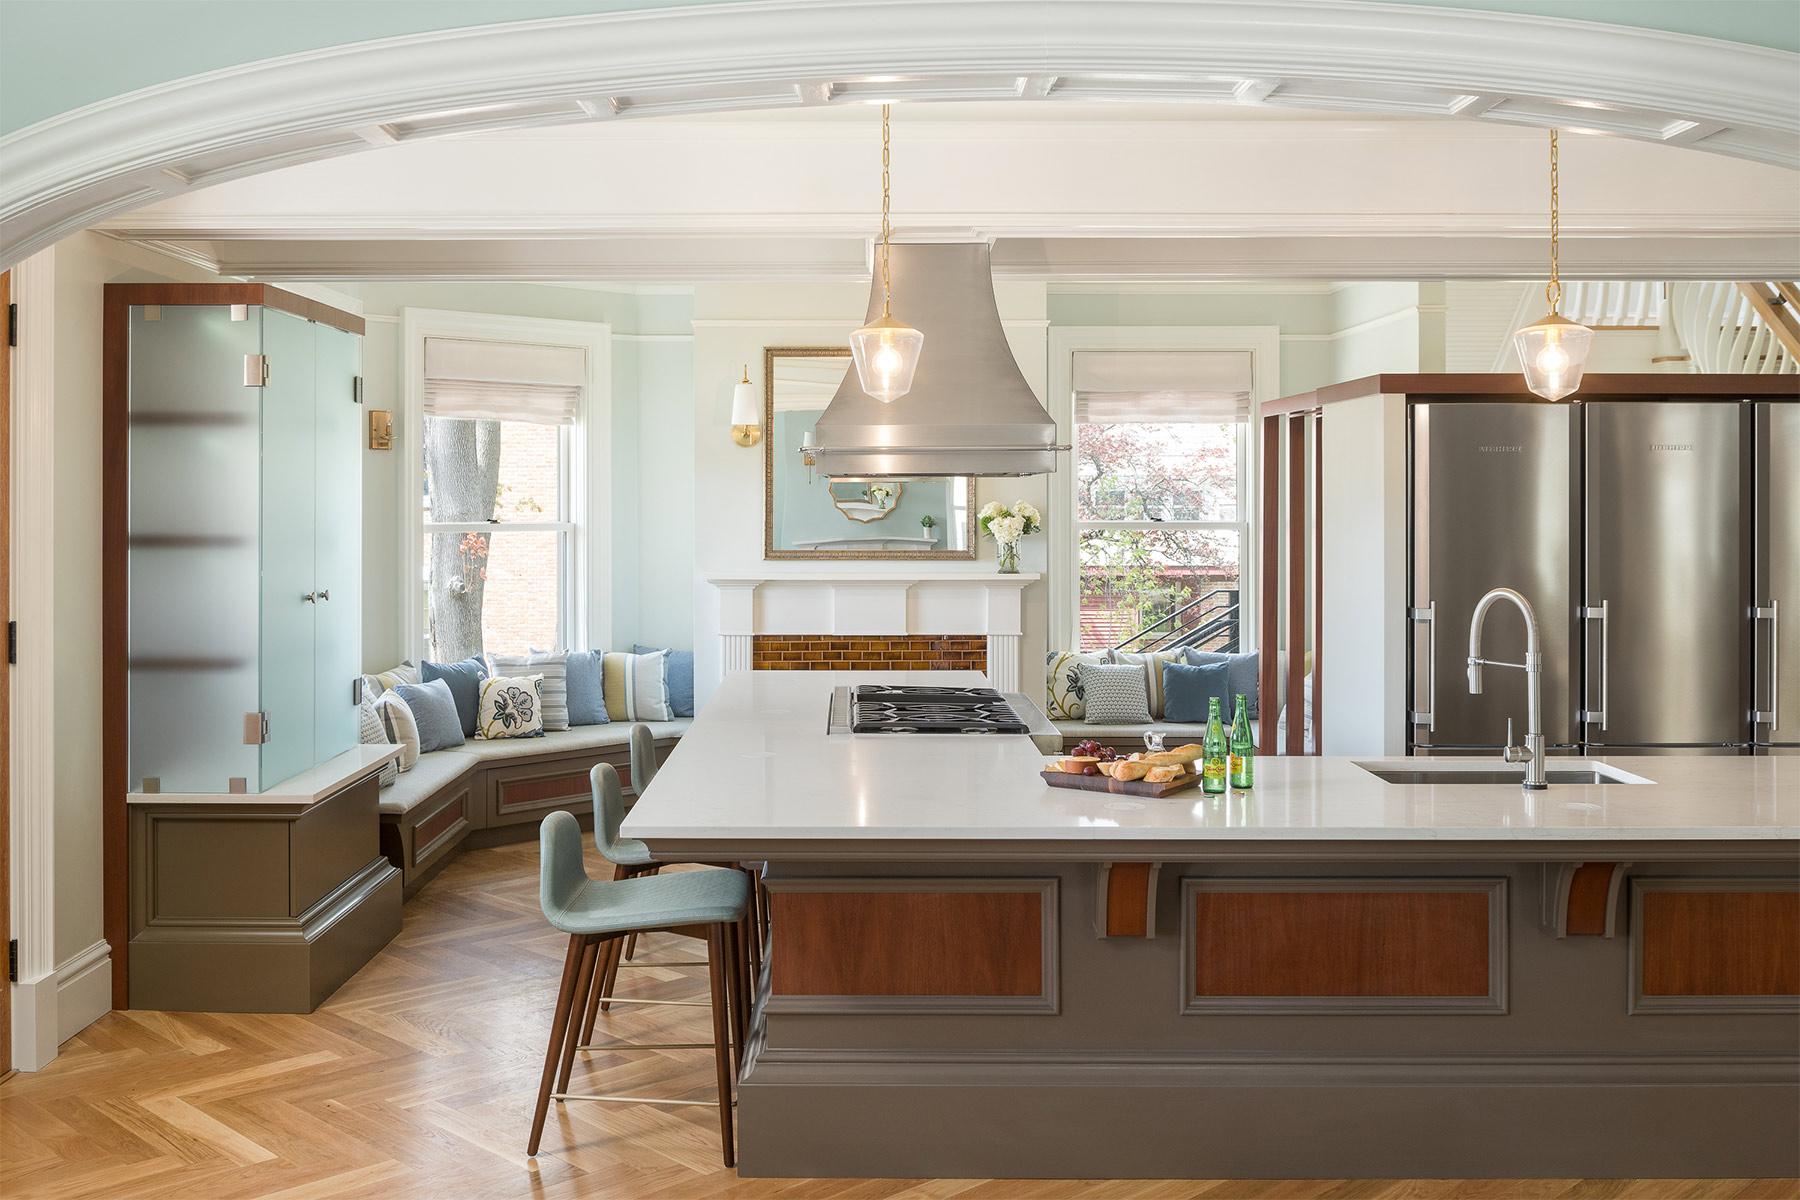 burdick kitchen interior design